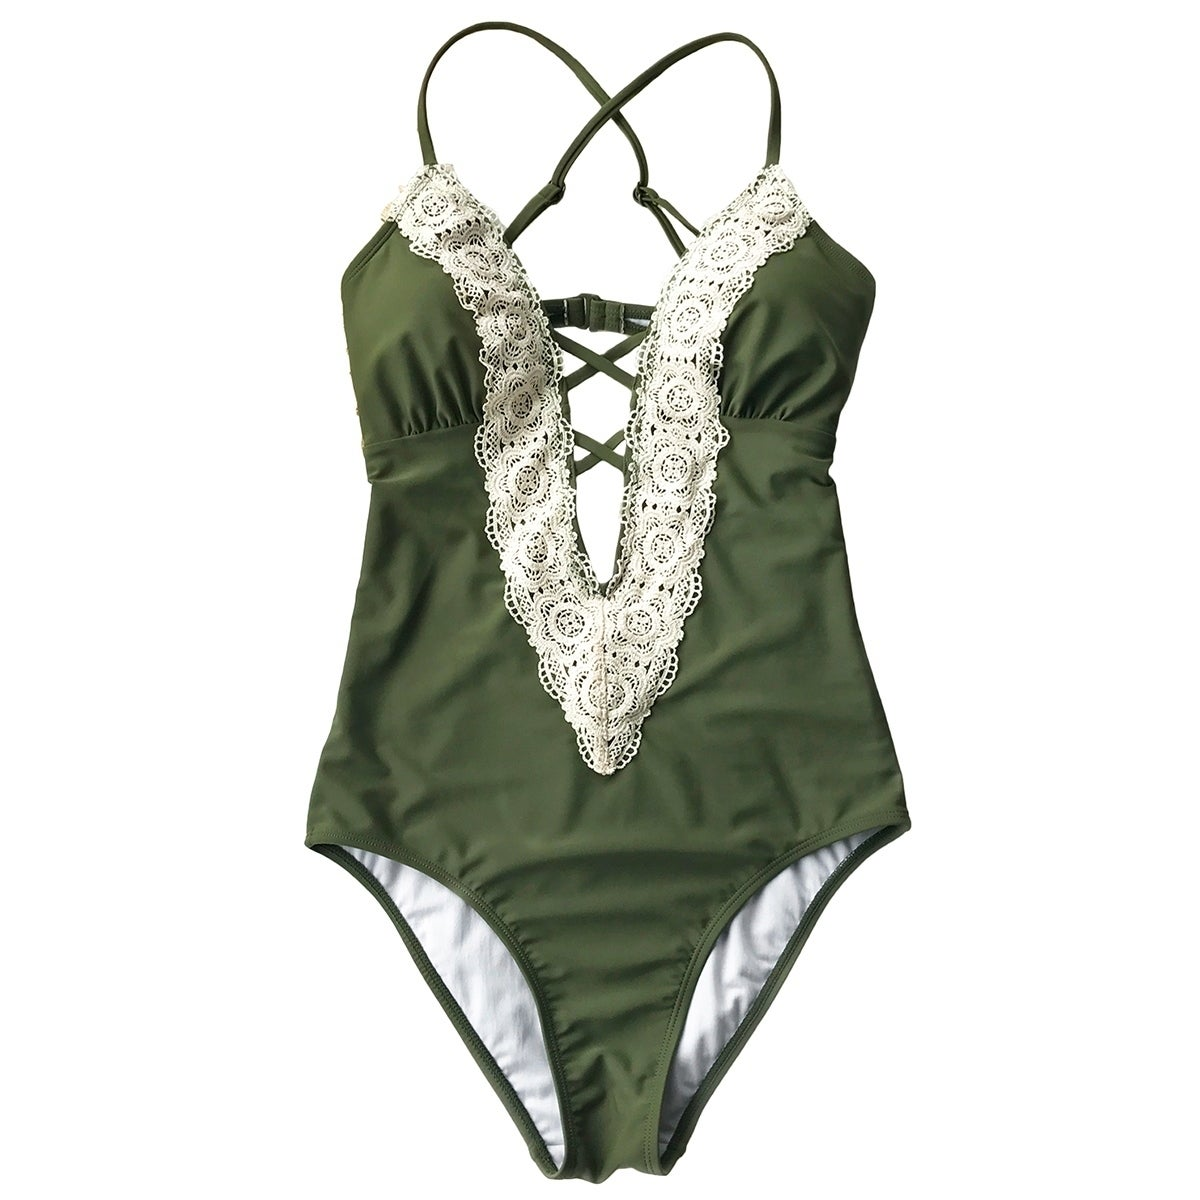 1b31777fd05 Cupshe Women's Solid Color Vintage Lace Hem Deep V neck One Piece Swimsuit  Padded Swimwear Bathing Suit